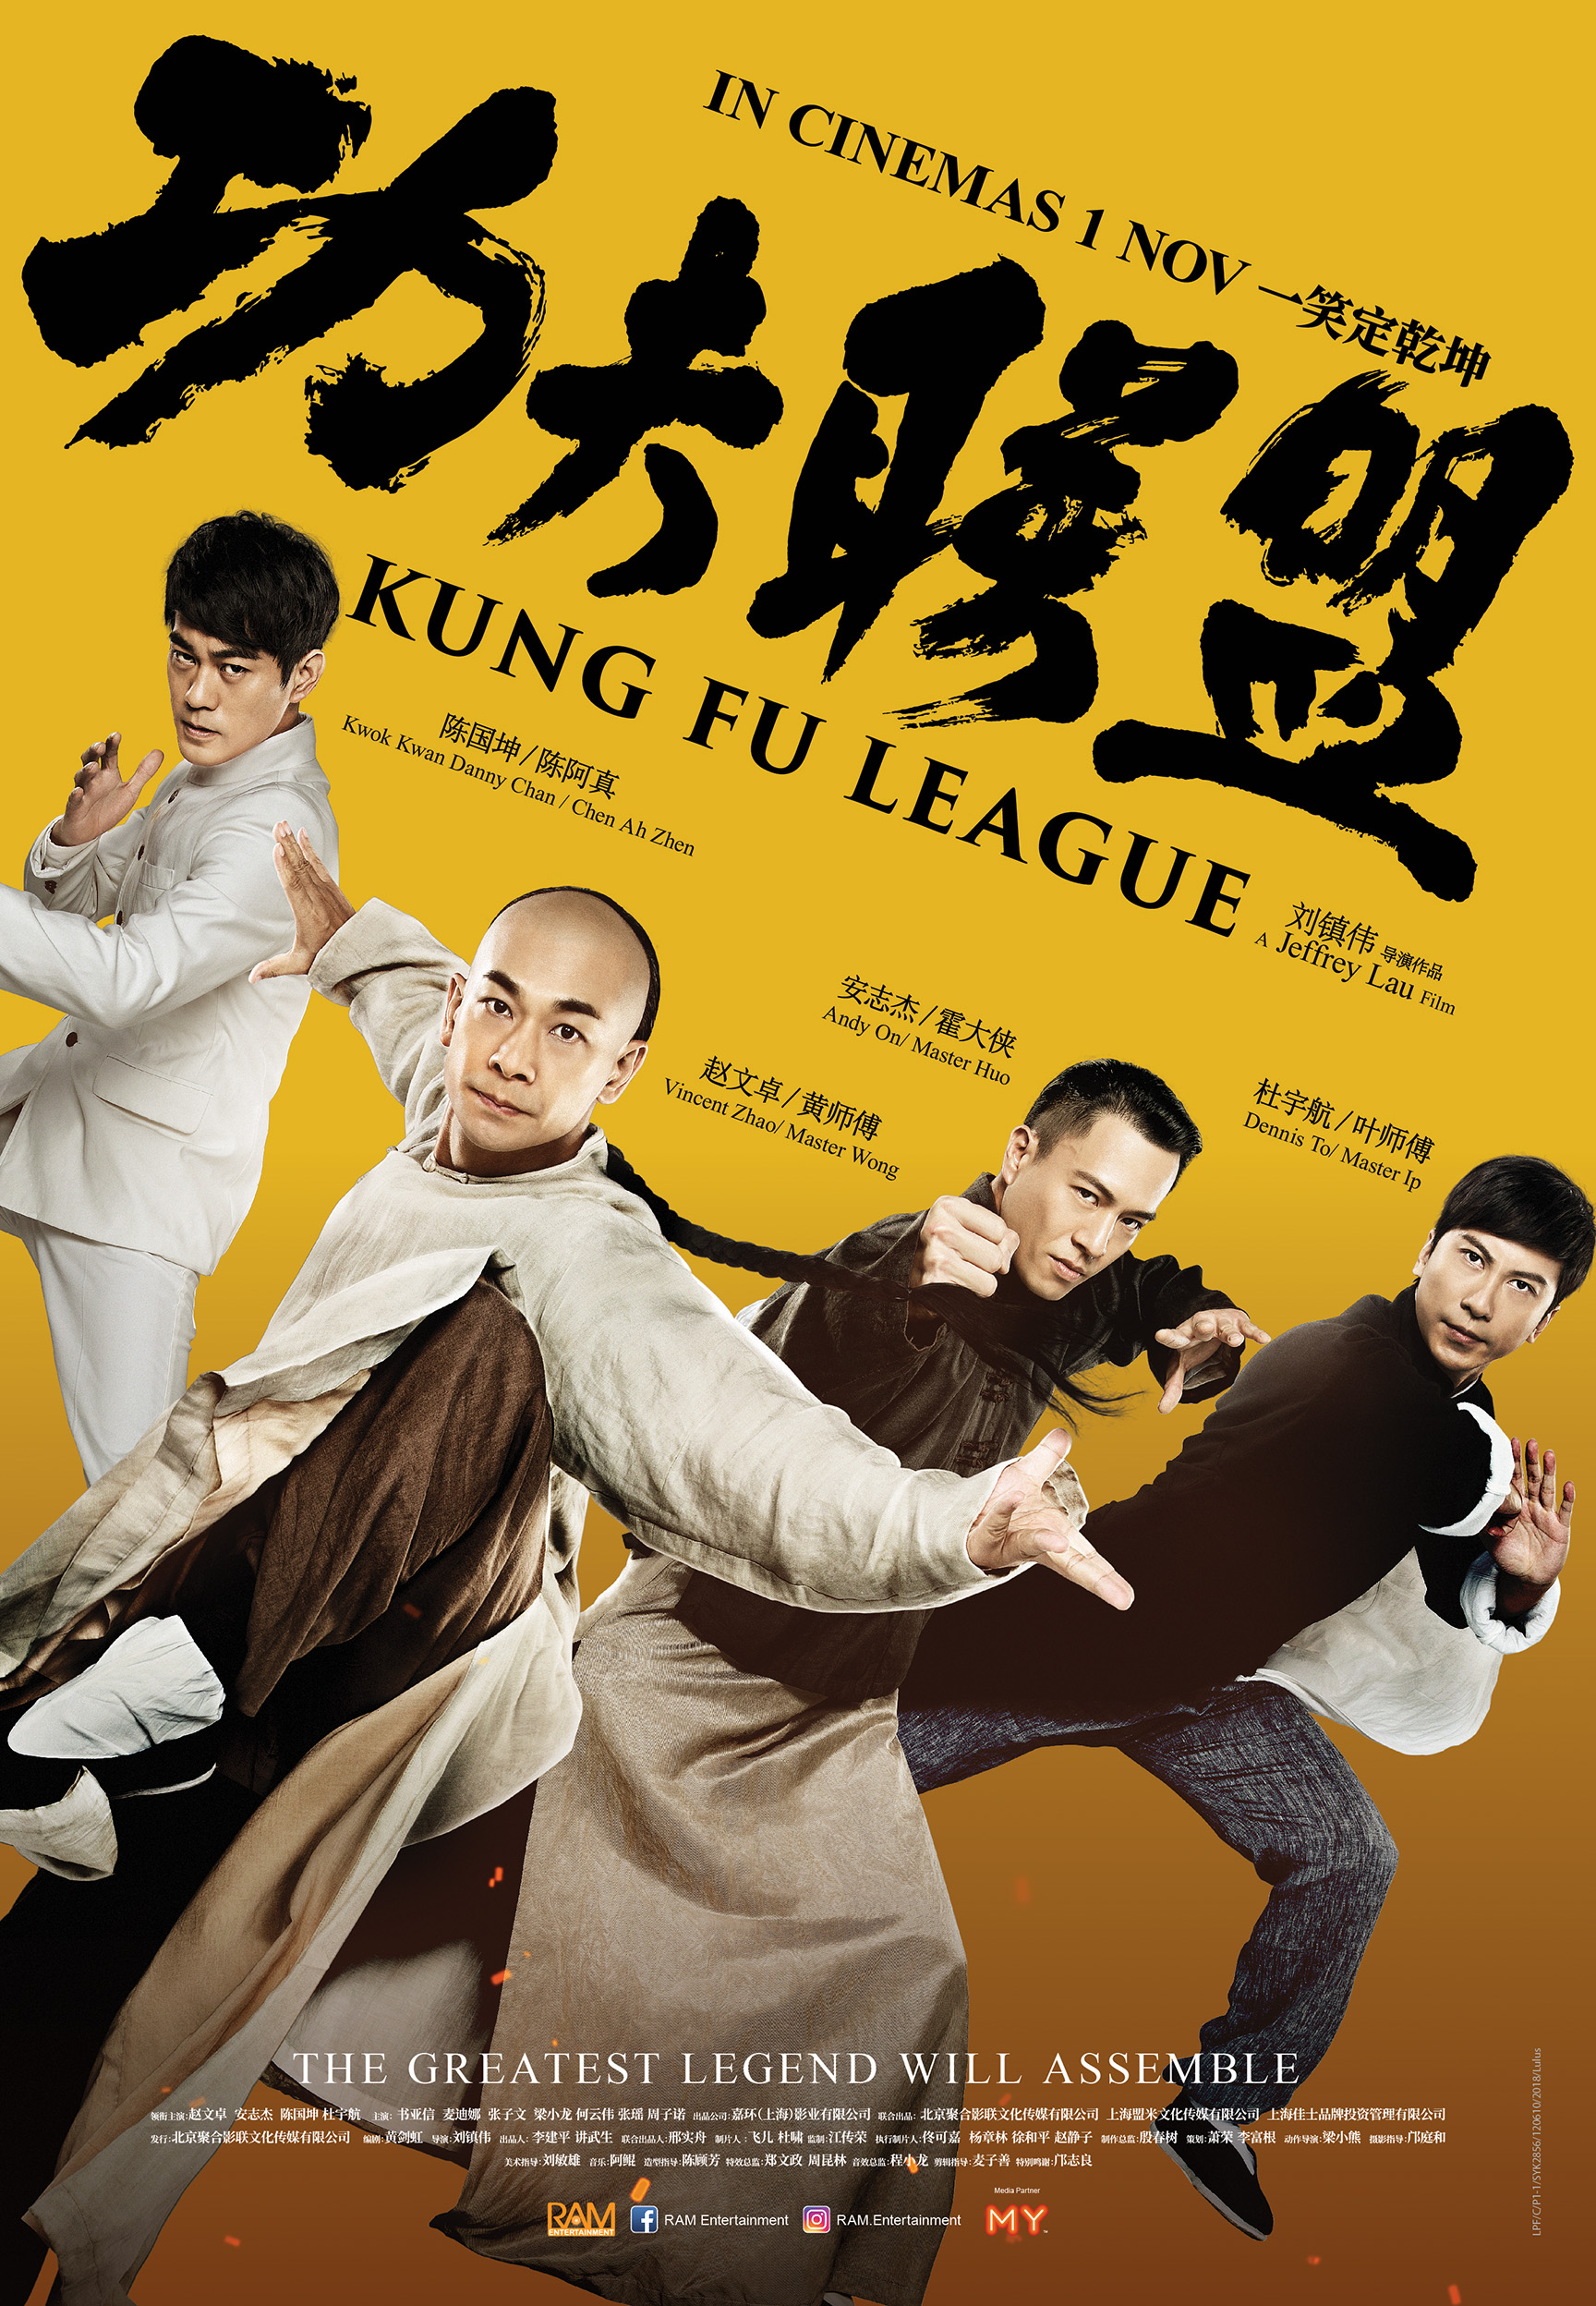 Kung Fu League <br/> 功夫联盟 <br/> 1 November 2018